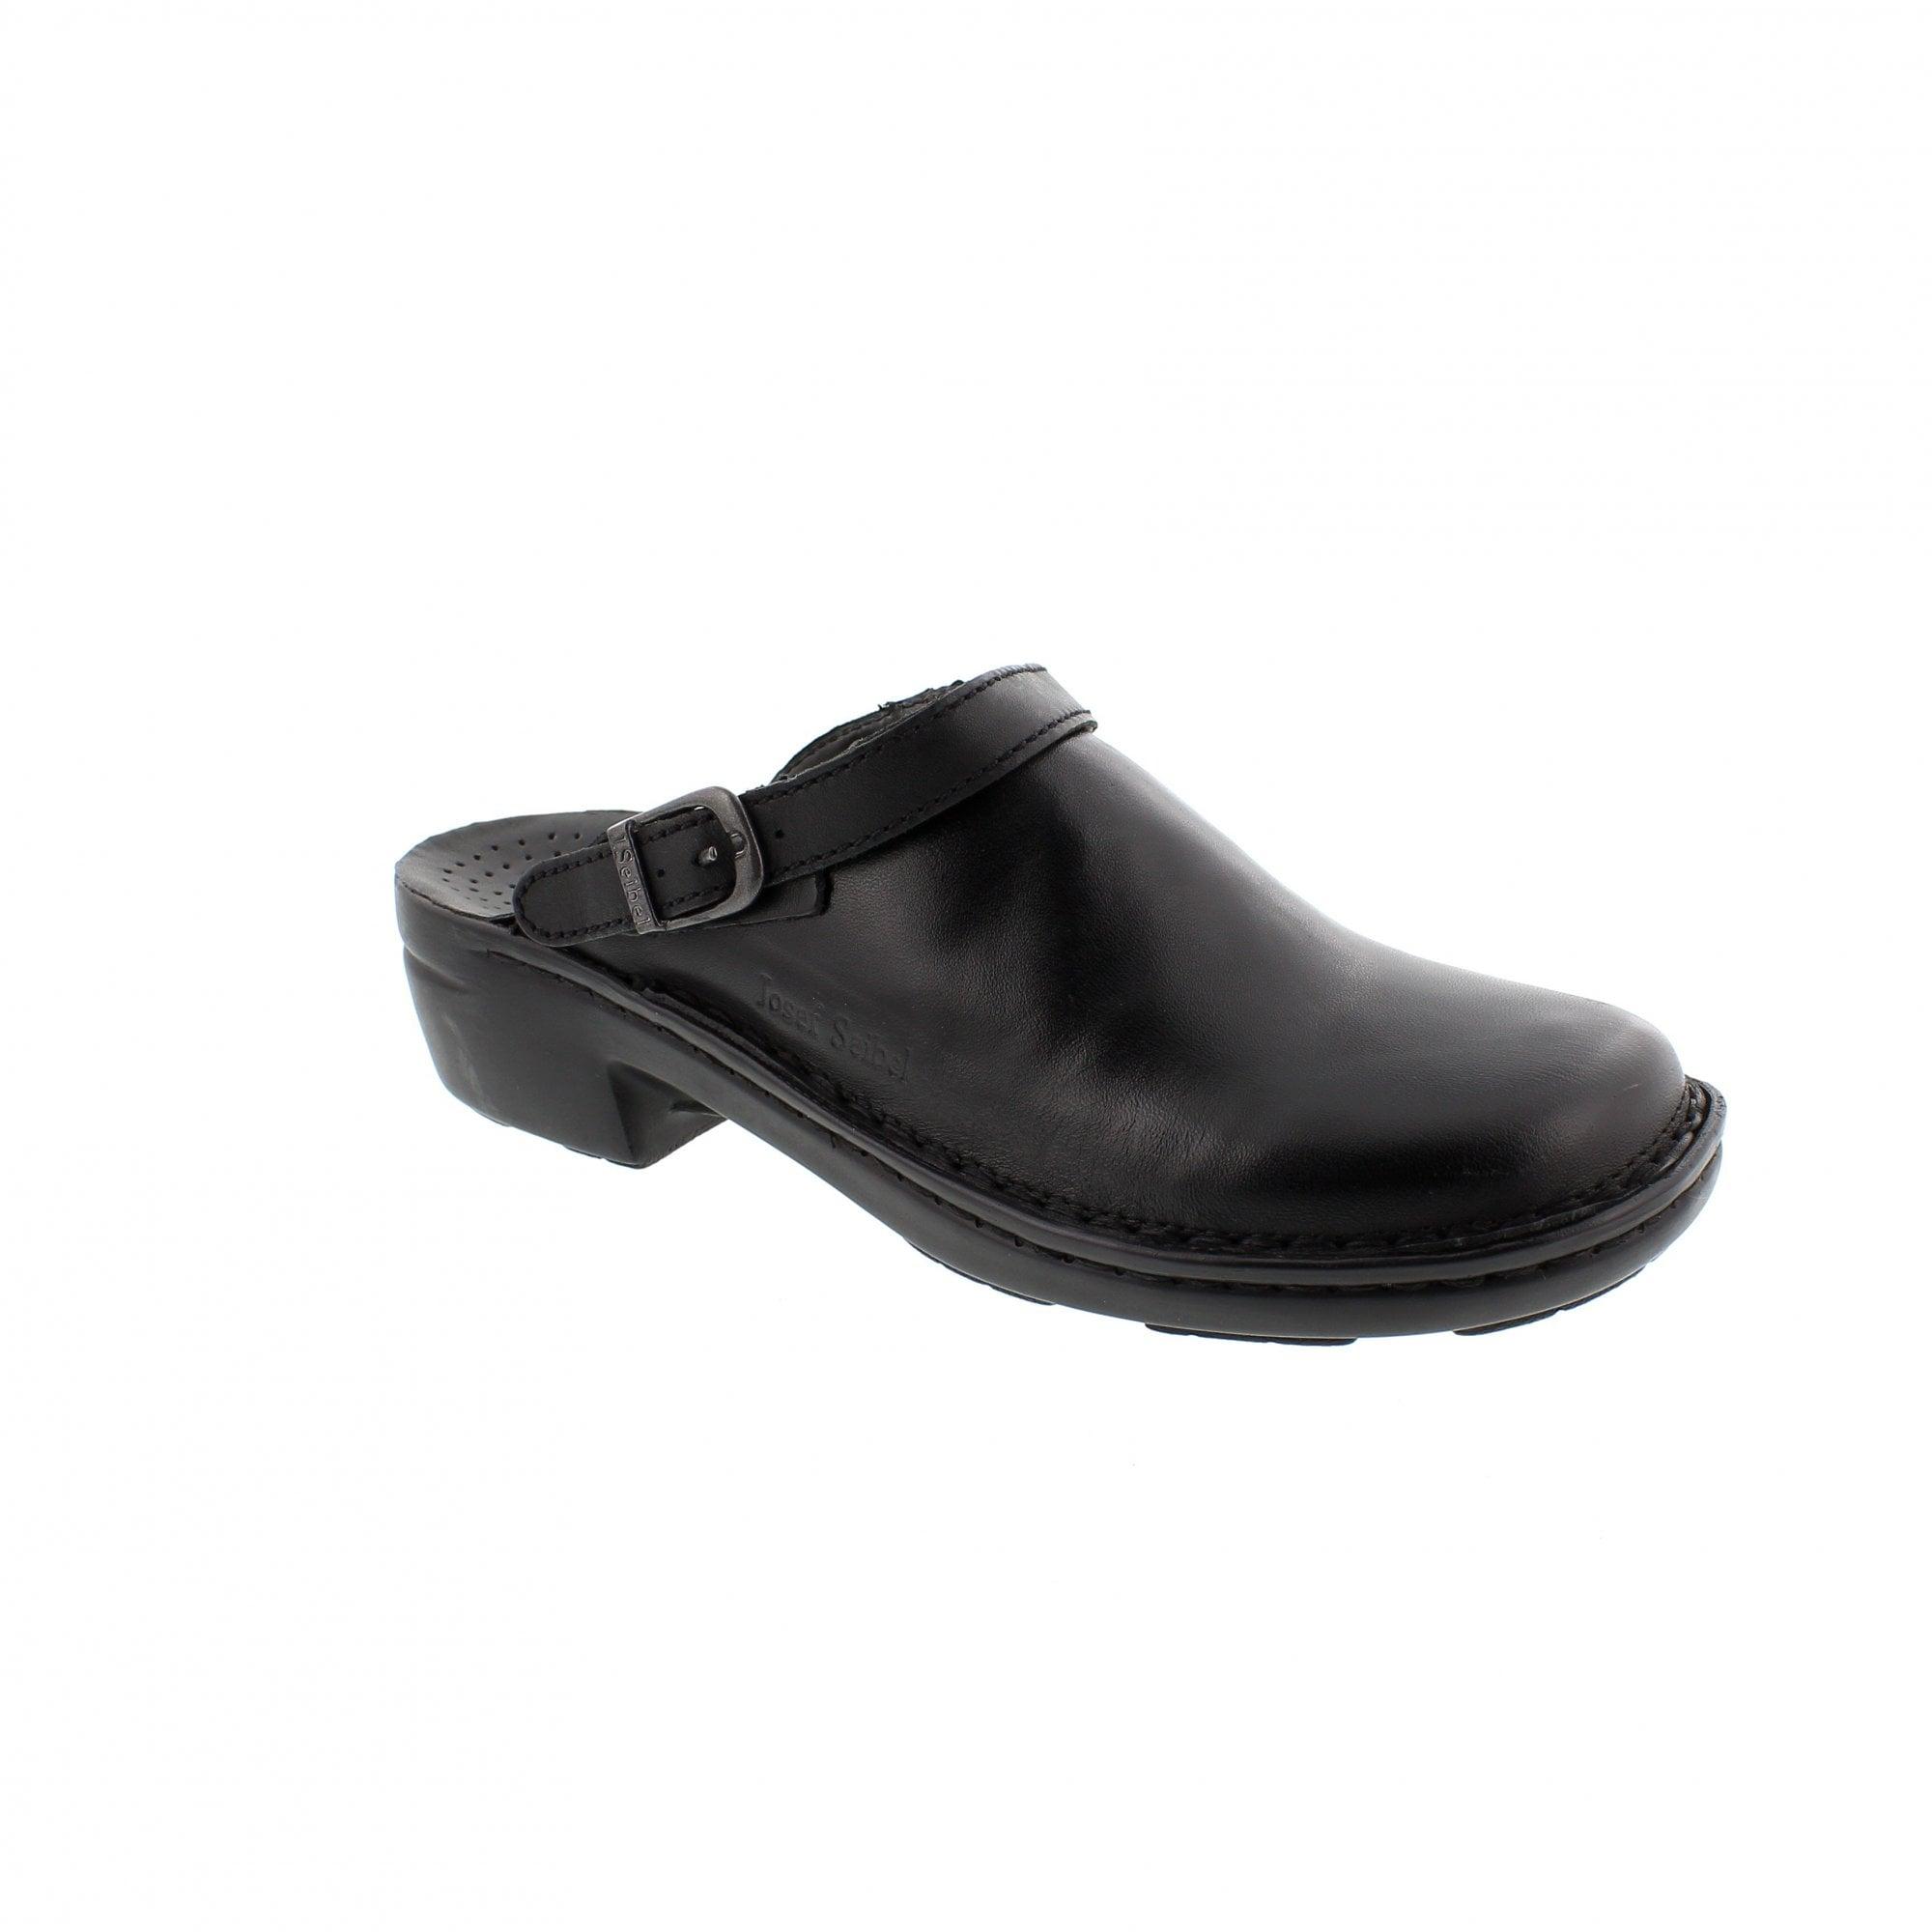 Josef Seibel Betsy 95920-23600 Black Womens Clogs | Rogerson Shoes